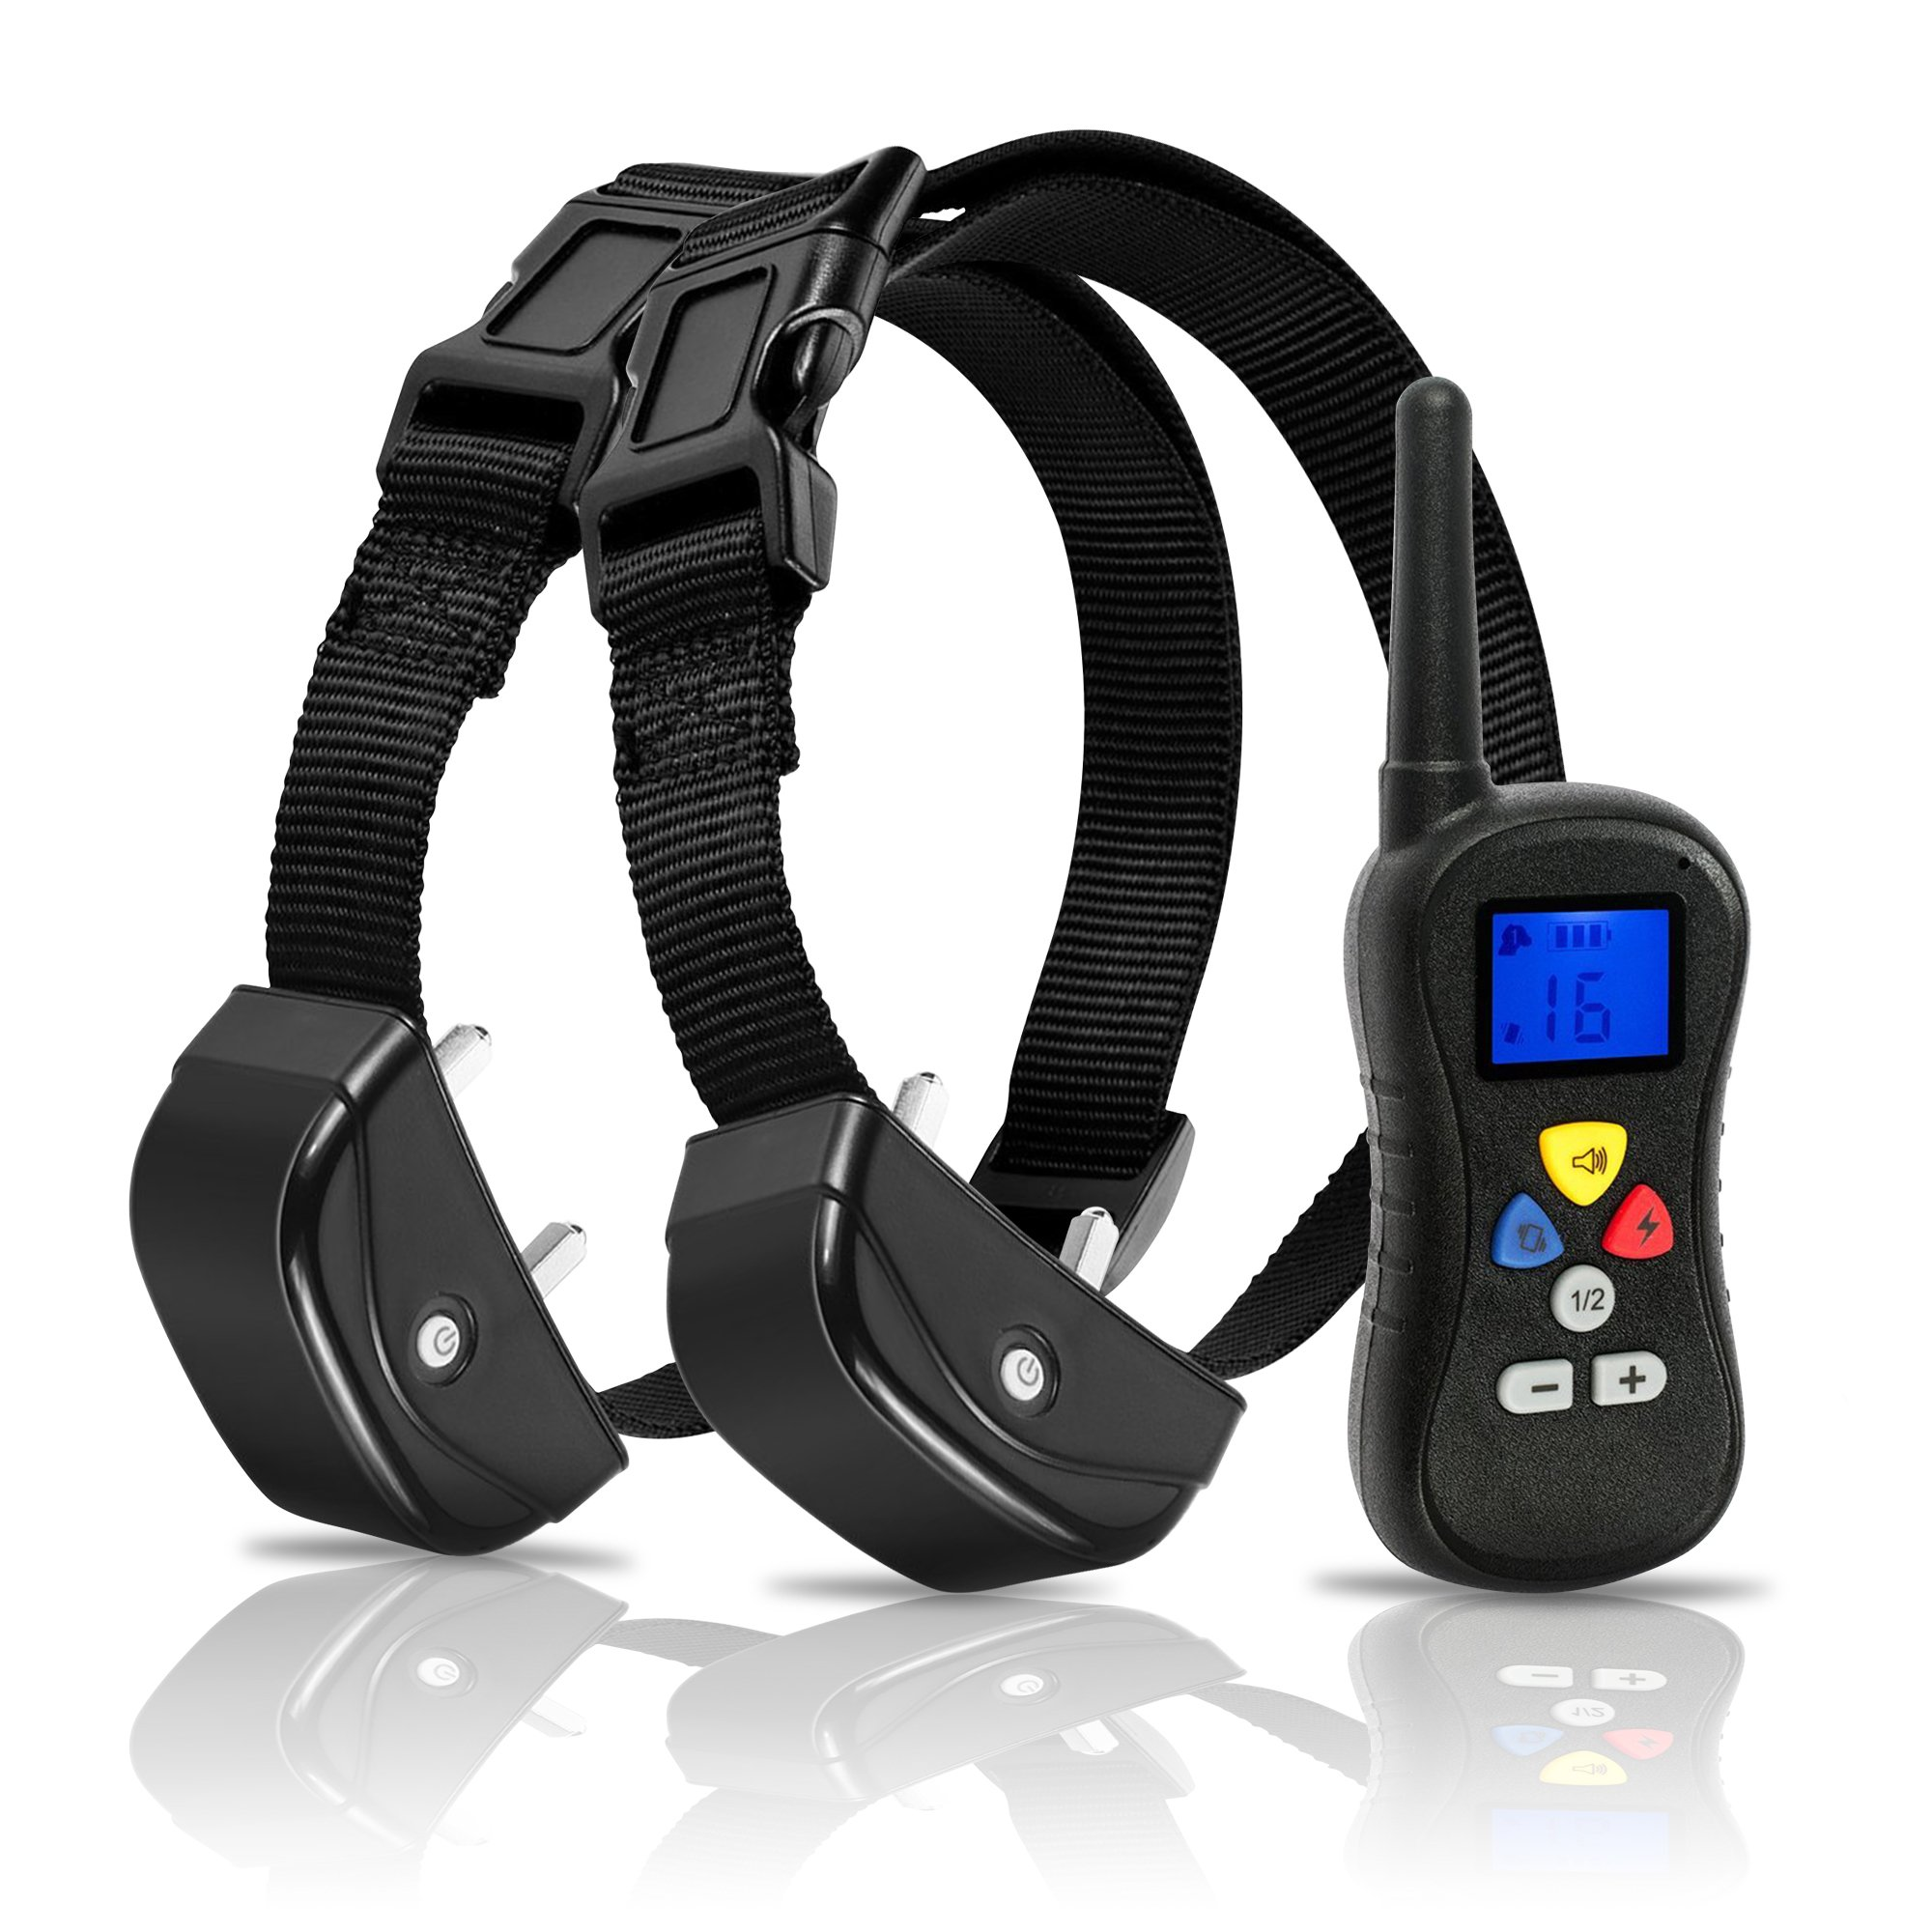 Deluxe Remote Pet Trainer Nylon Dog Collars (300m, Modes: Sound, Vibration & Shock)